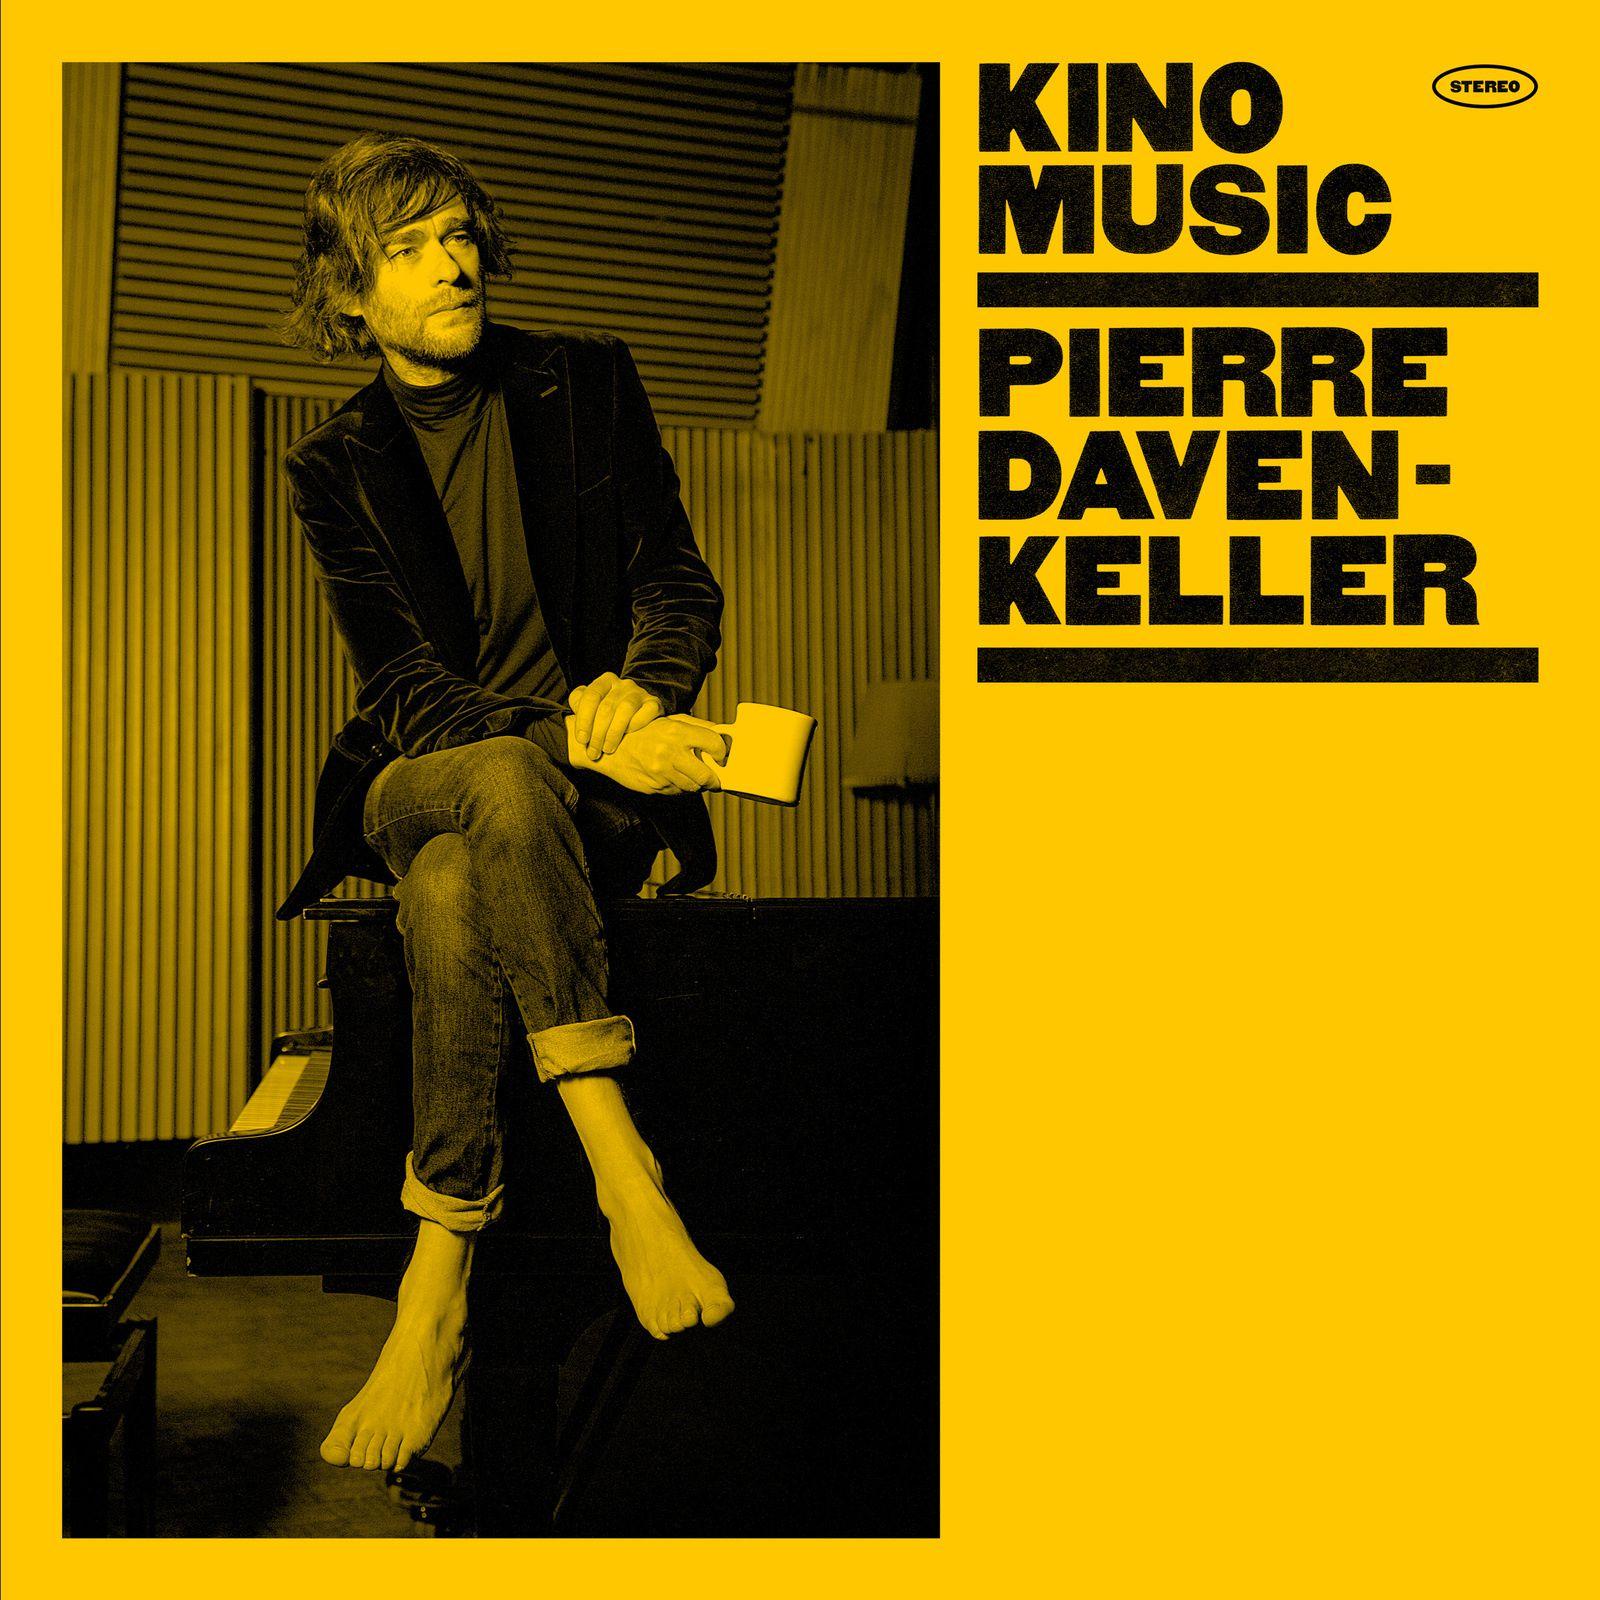 Kino Music, Pierre Daven Keller